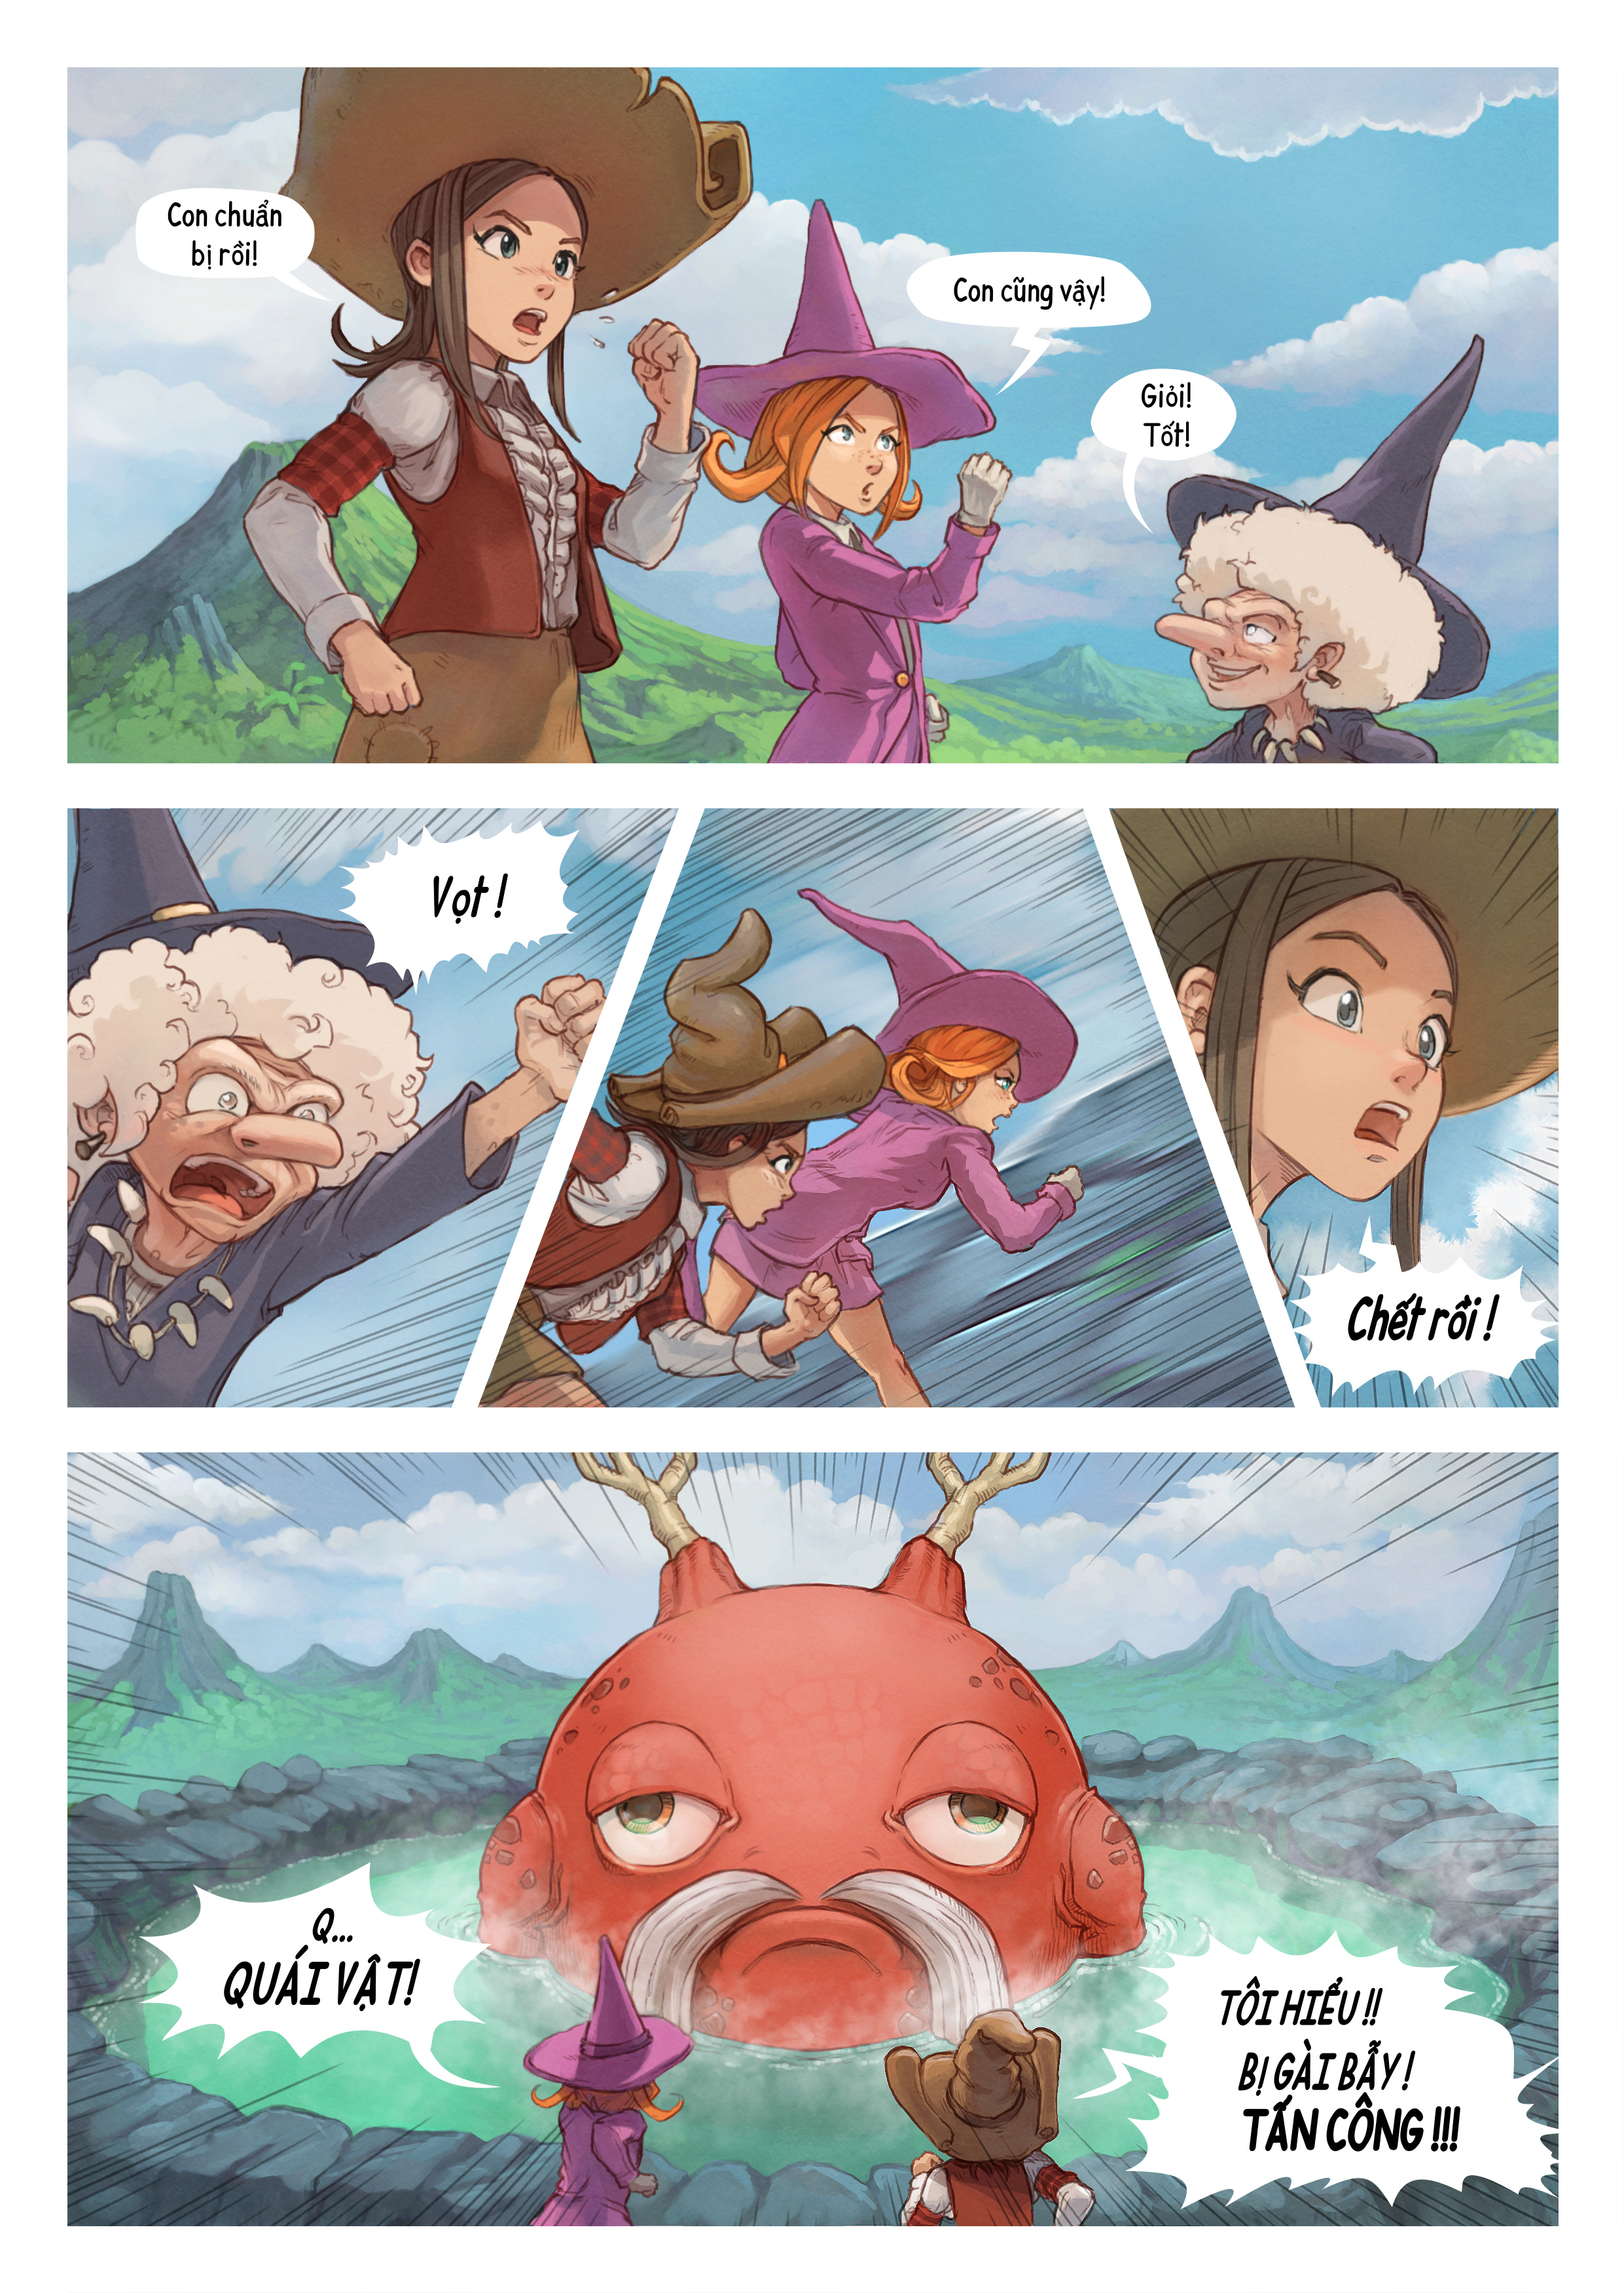 A webcomic page of Pepper&Carrot, Tập 16 [vi], trang 5